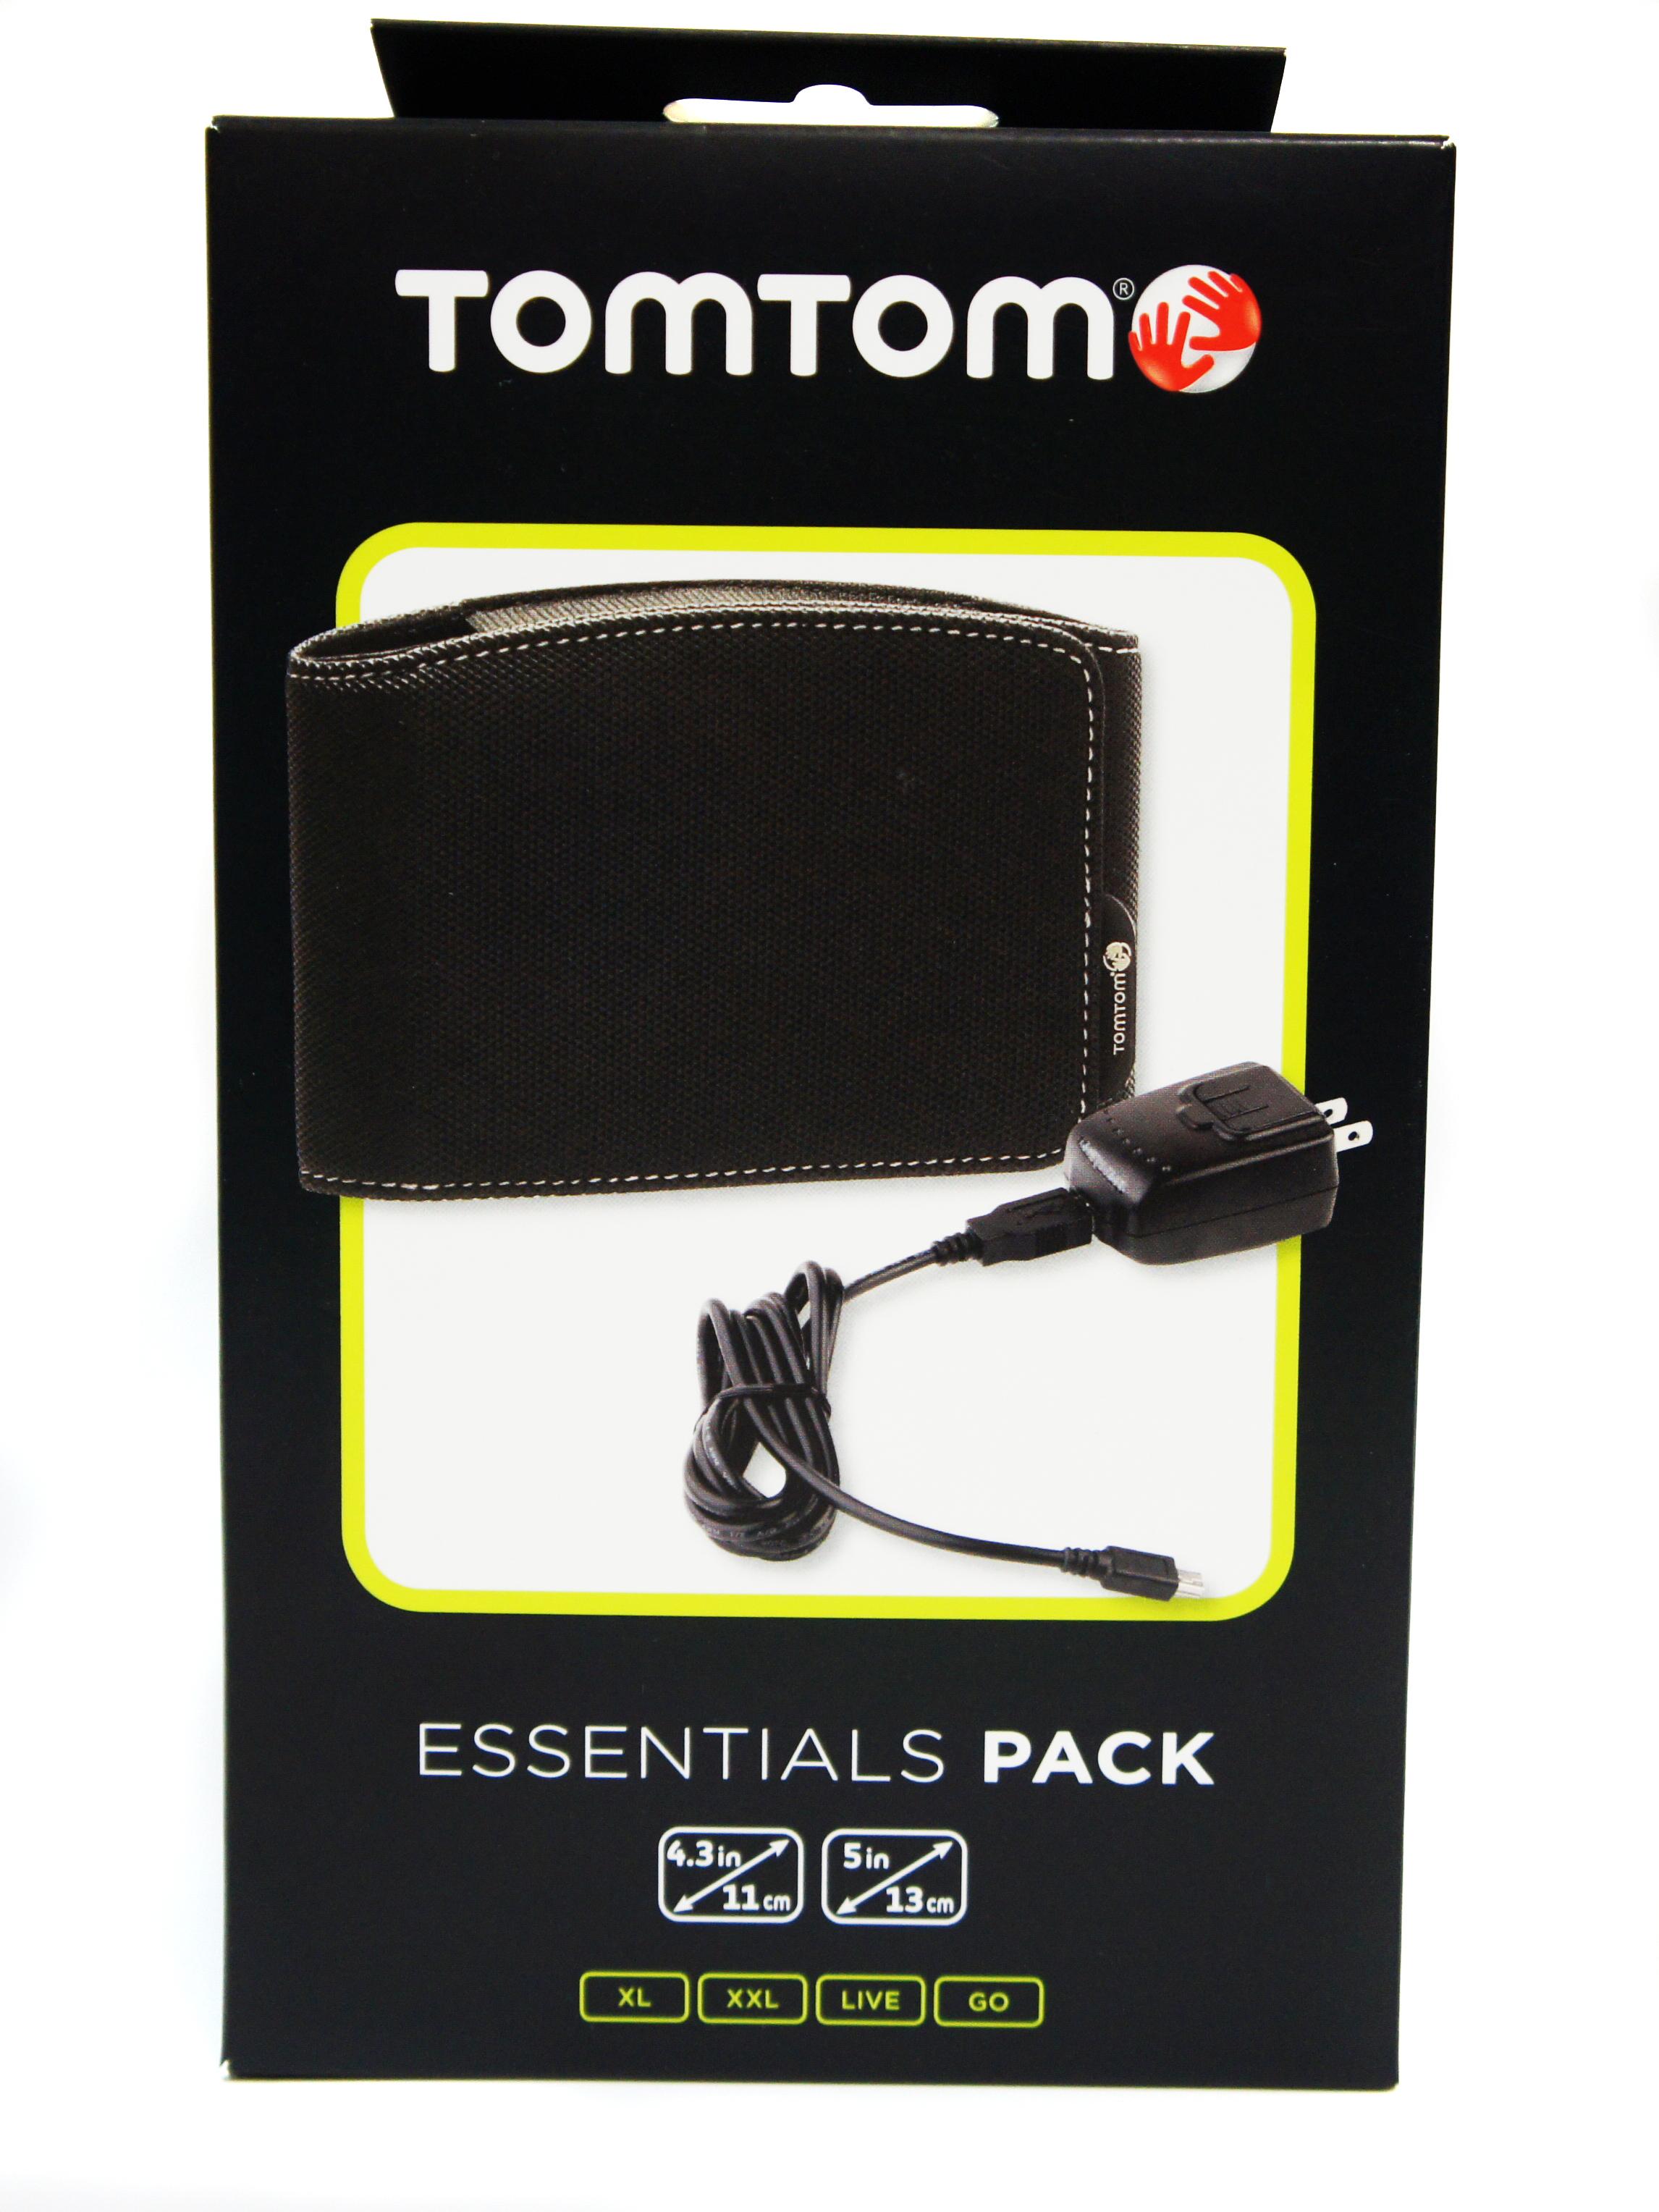 tomtom essentials pack 4 3 premium gps holder pouch ebay. Black Bedroom Furniture Sets. Home Design Ideas